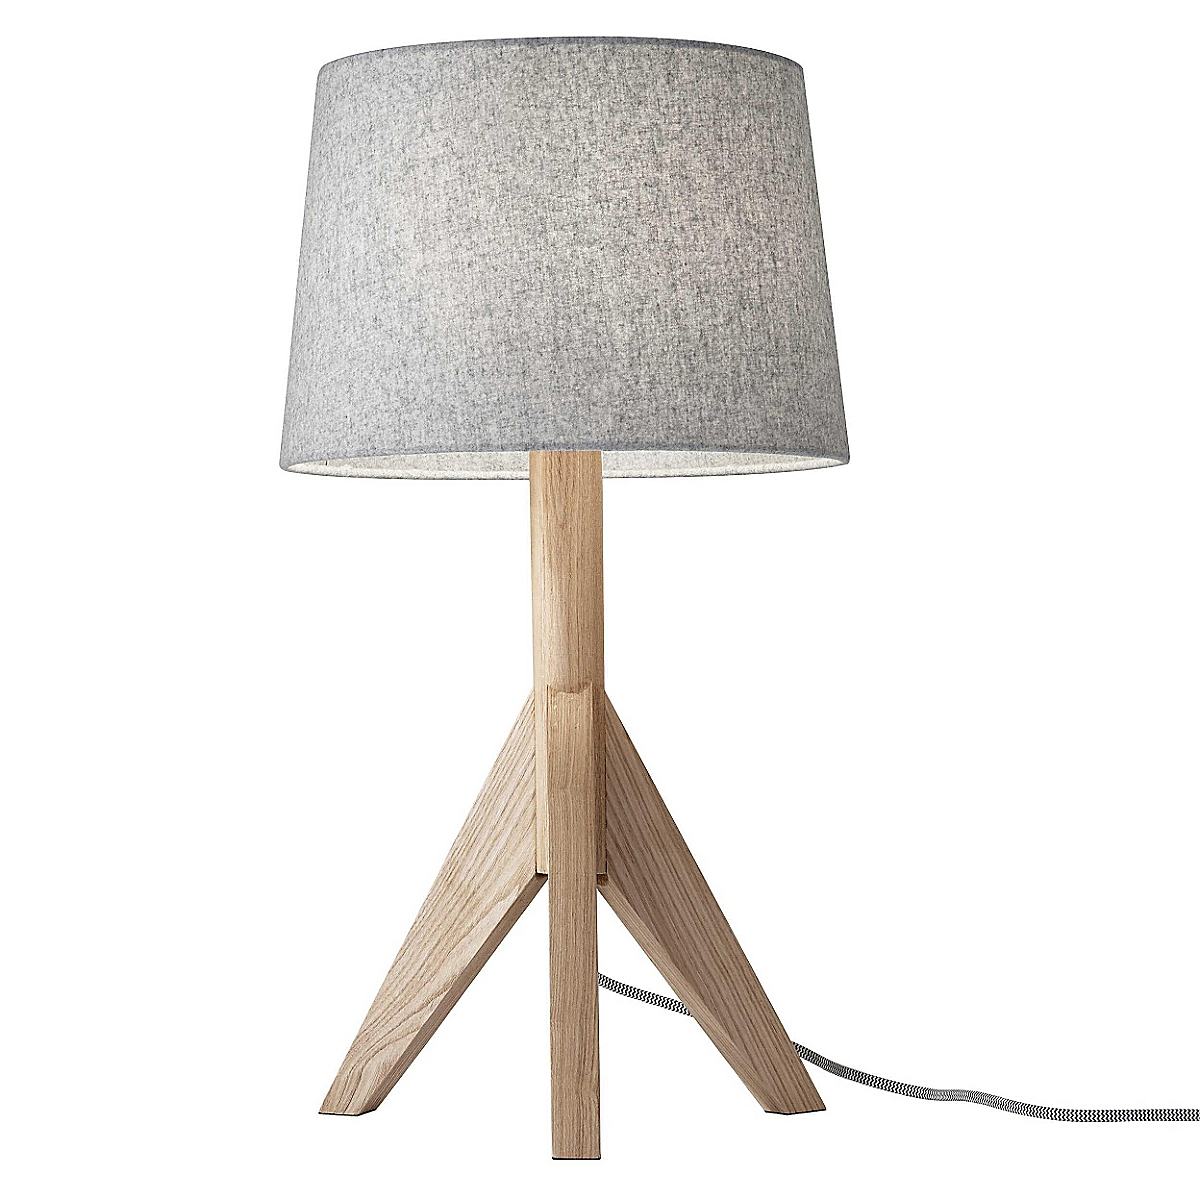 Modish Table Lamp